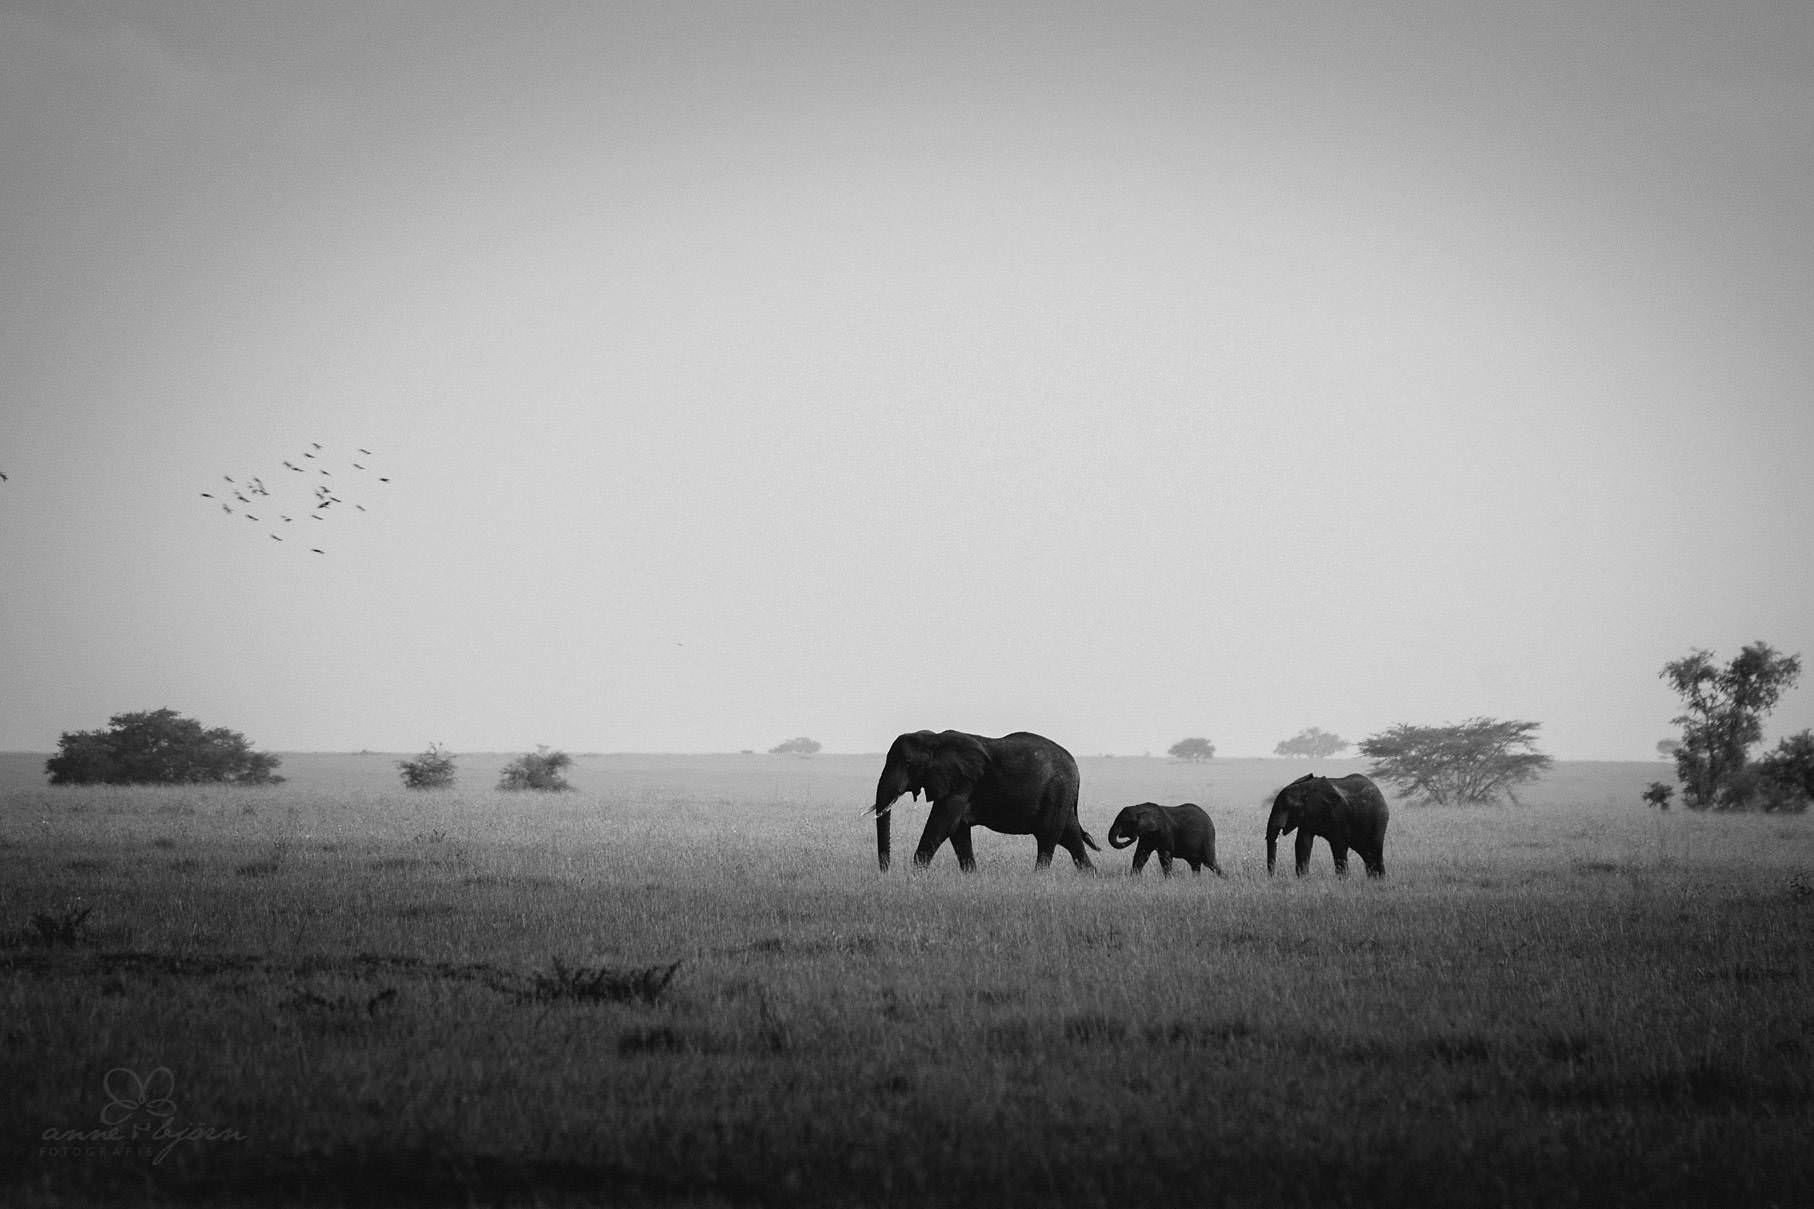 0038 tansania nd8 0481 anne bjoern fotografie hochzeitsfotograf hamburg - This is Tanzania - Serengeti, Kilimanjaro & Sansibar